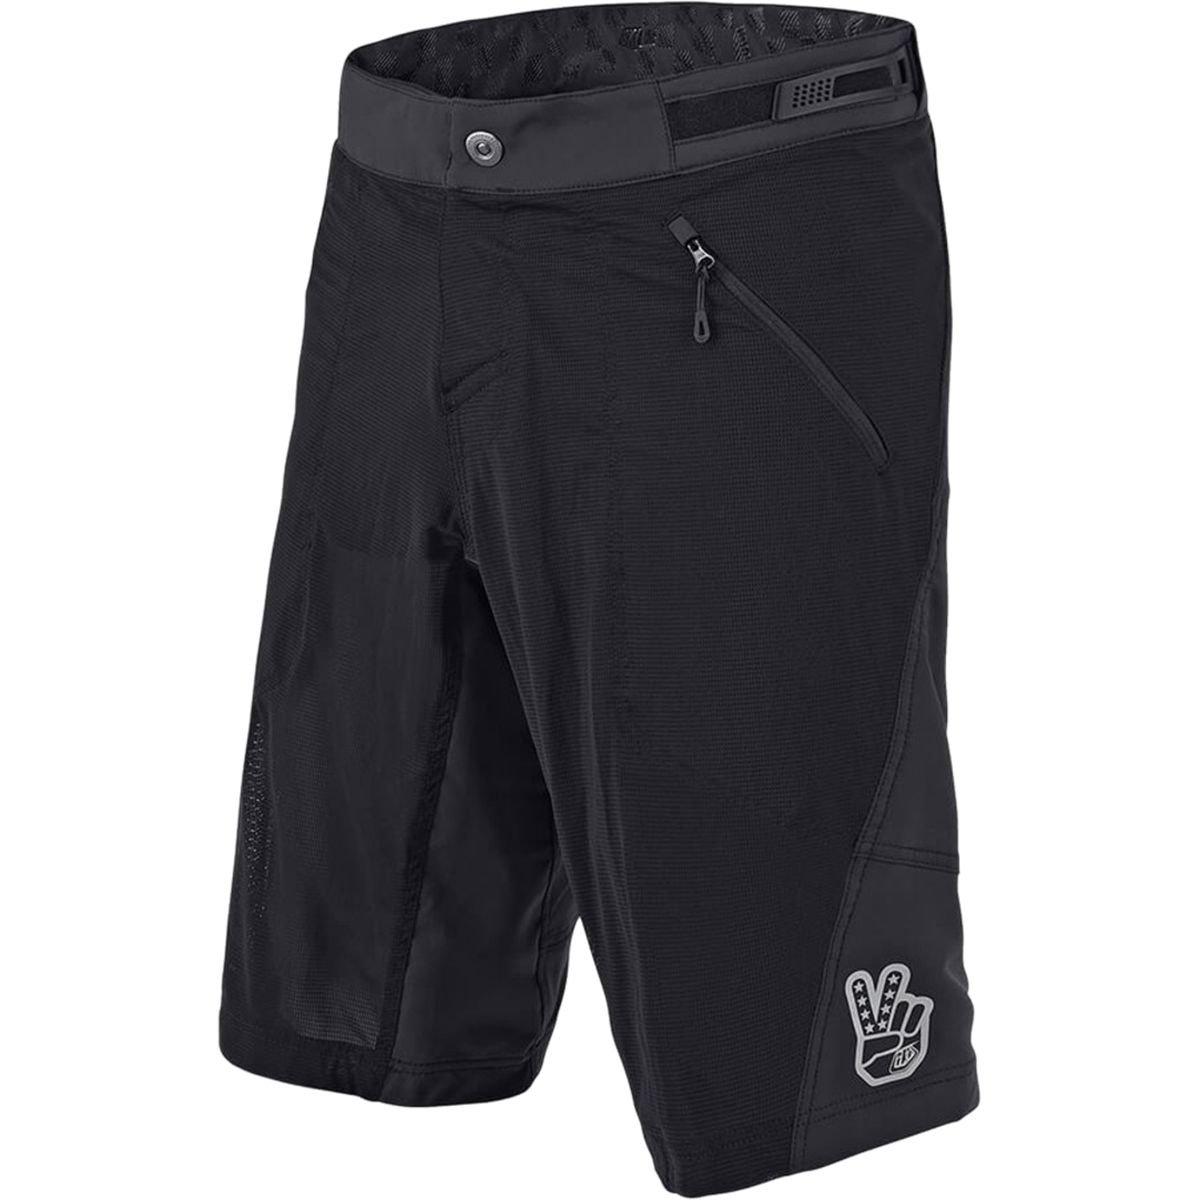 2018 Troy Lee Designs Skyline Air Mountain Bike Shorts Shell-Black-32